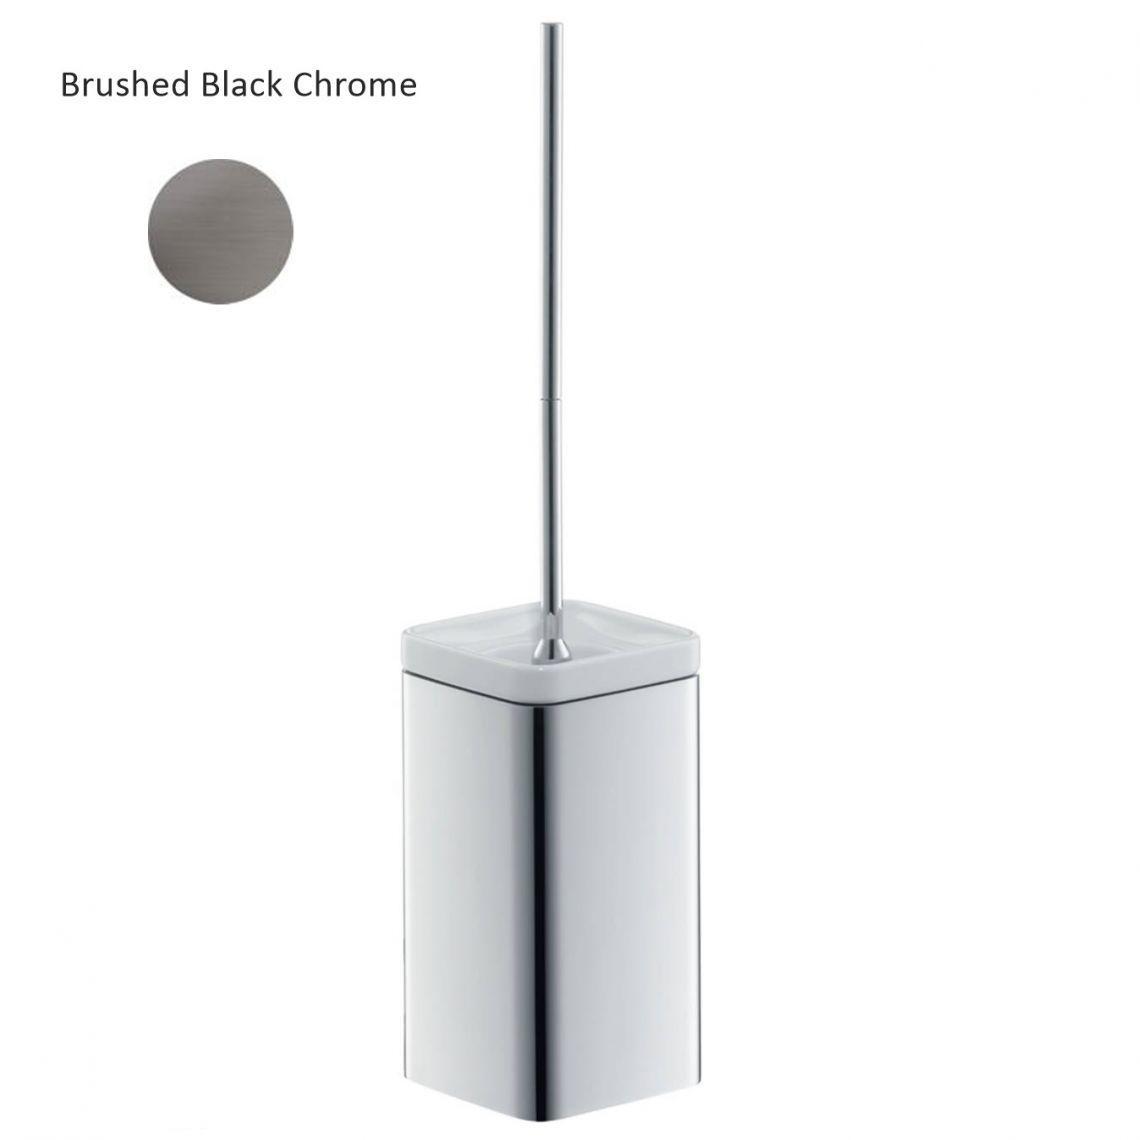 Щітка для унітазу Axor Urquiola, brushed black chrome (42435340)